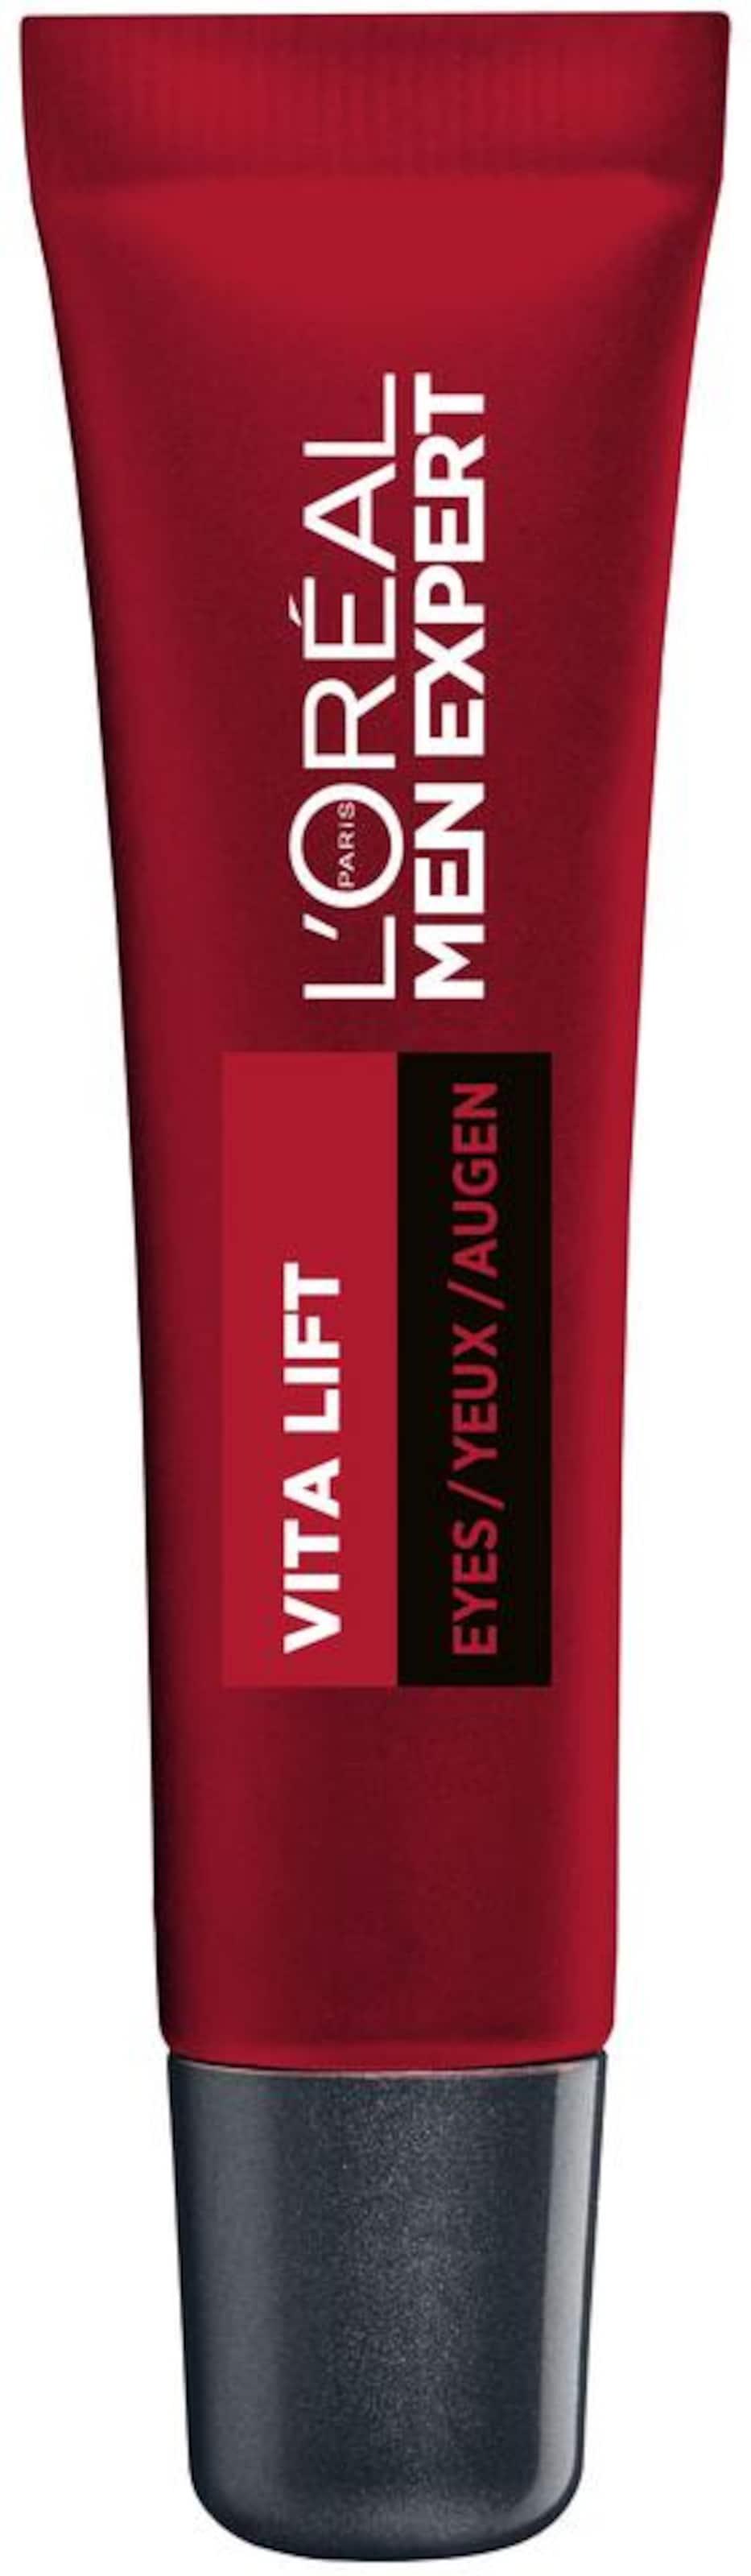 Augenpflege Lift Augenpflege' Paris RotSchwarz 5 Men 'vita In L'oréal Expert XZkiOuwPTl